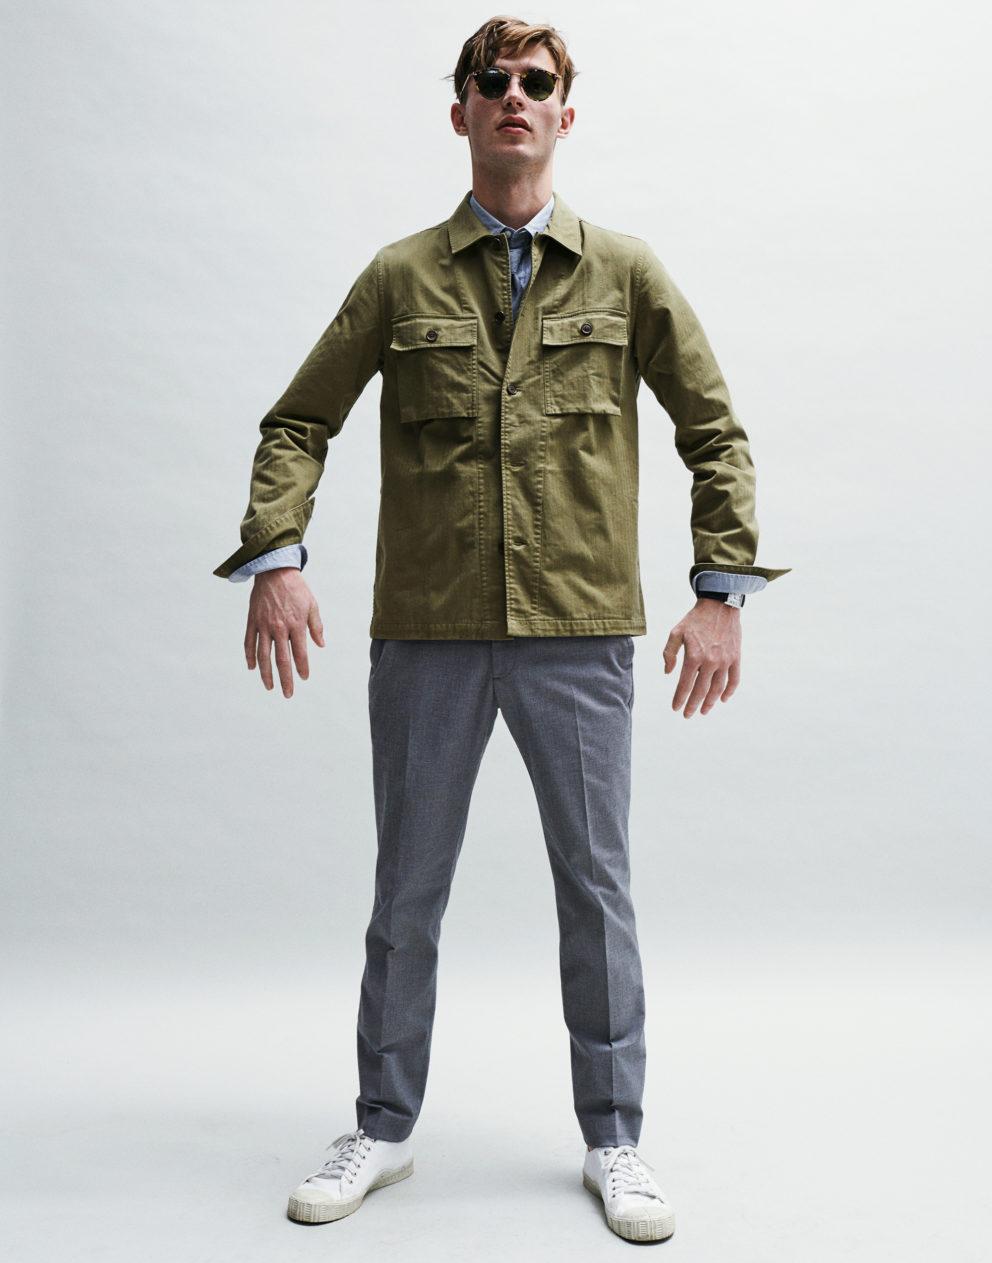 181212 0020 Bonobos Suiting Kit Butler 063 Christian Hogstedt